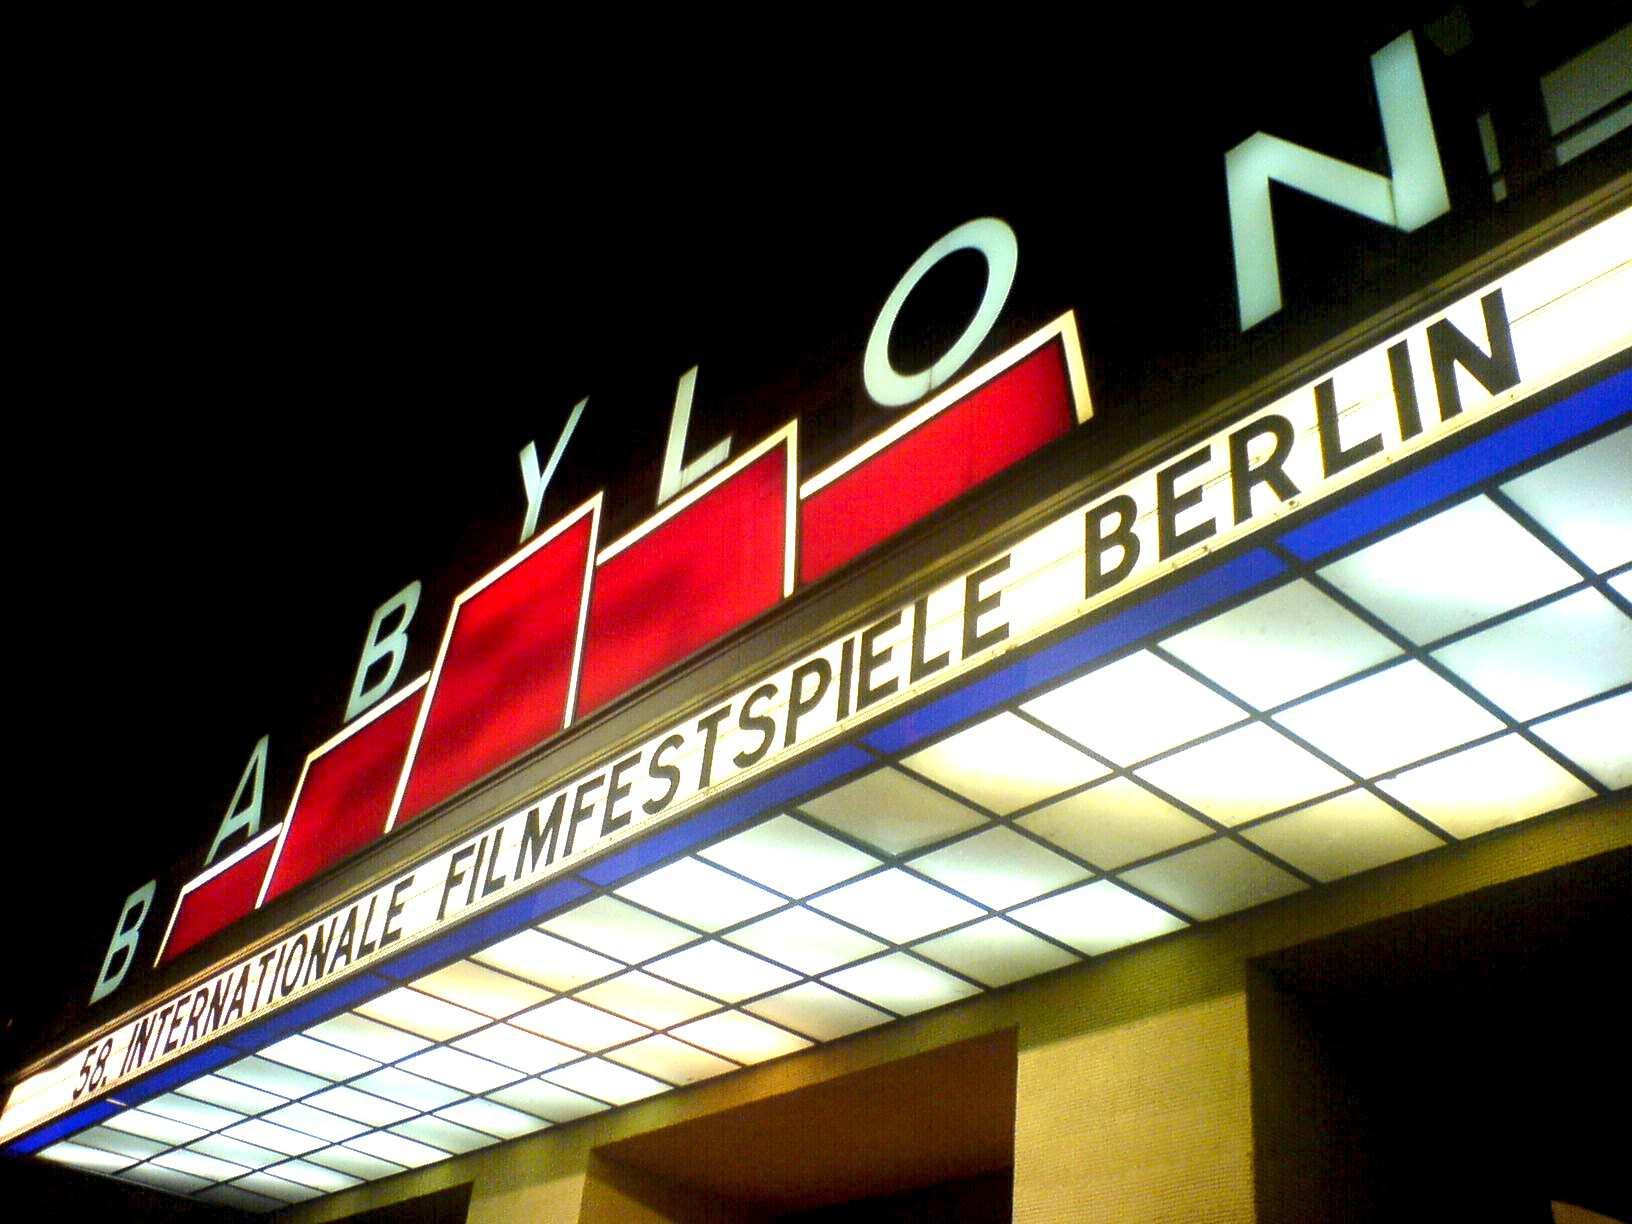 babylon-berlin-berlinale.jpg